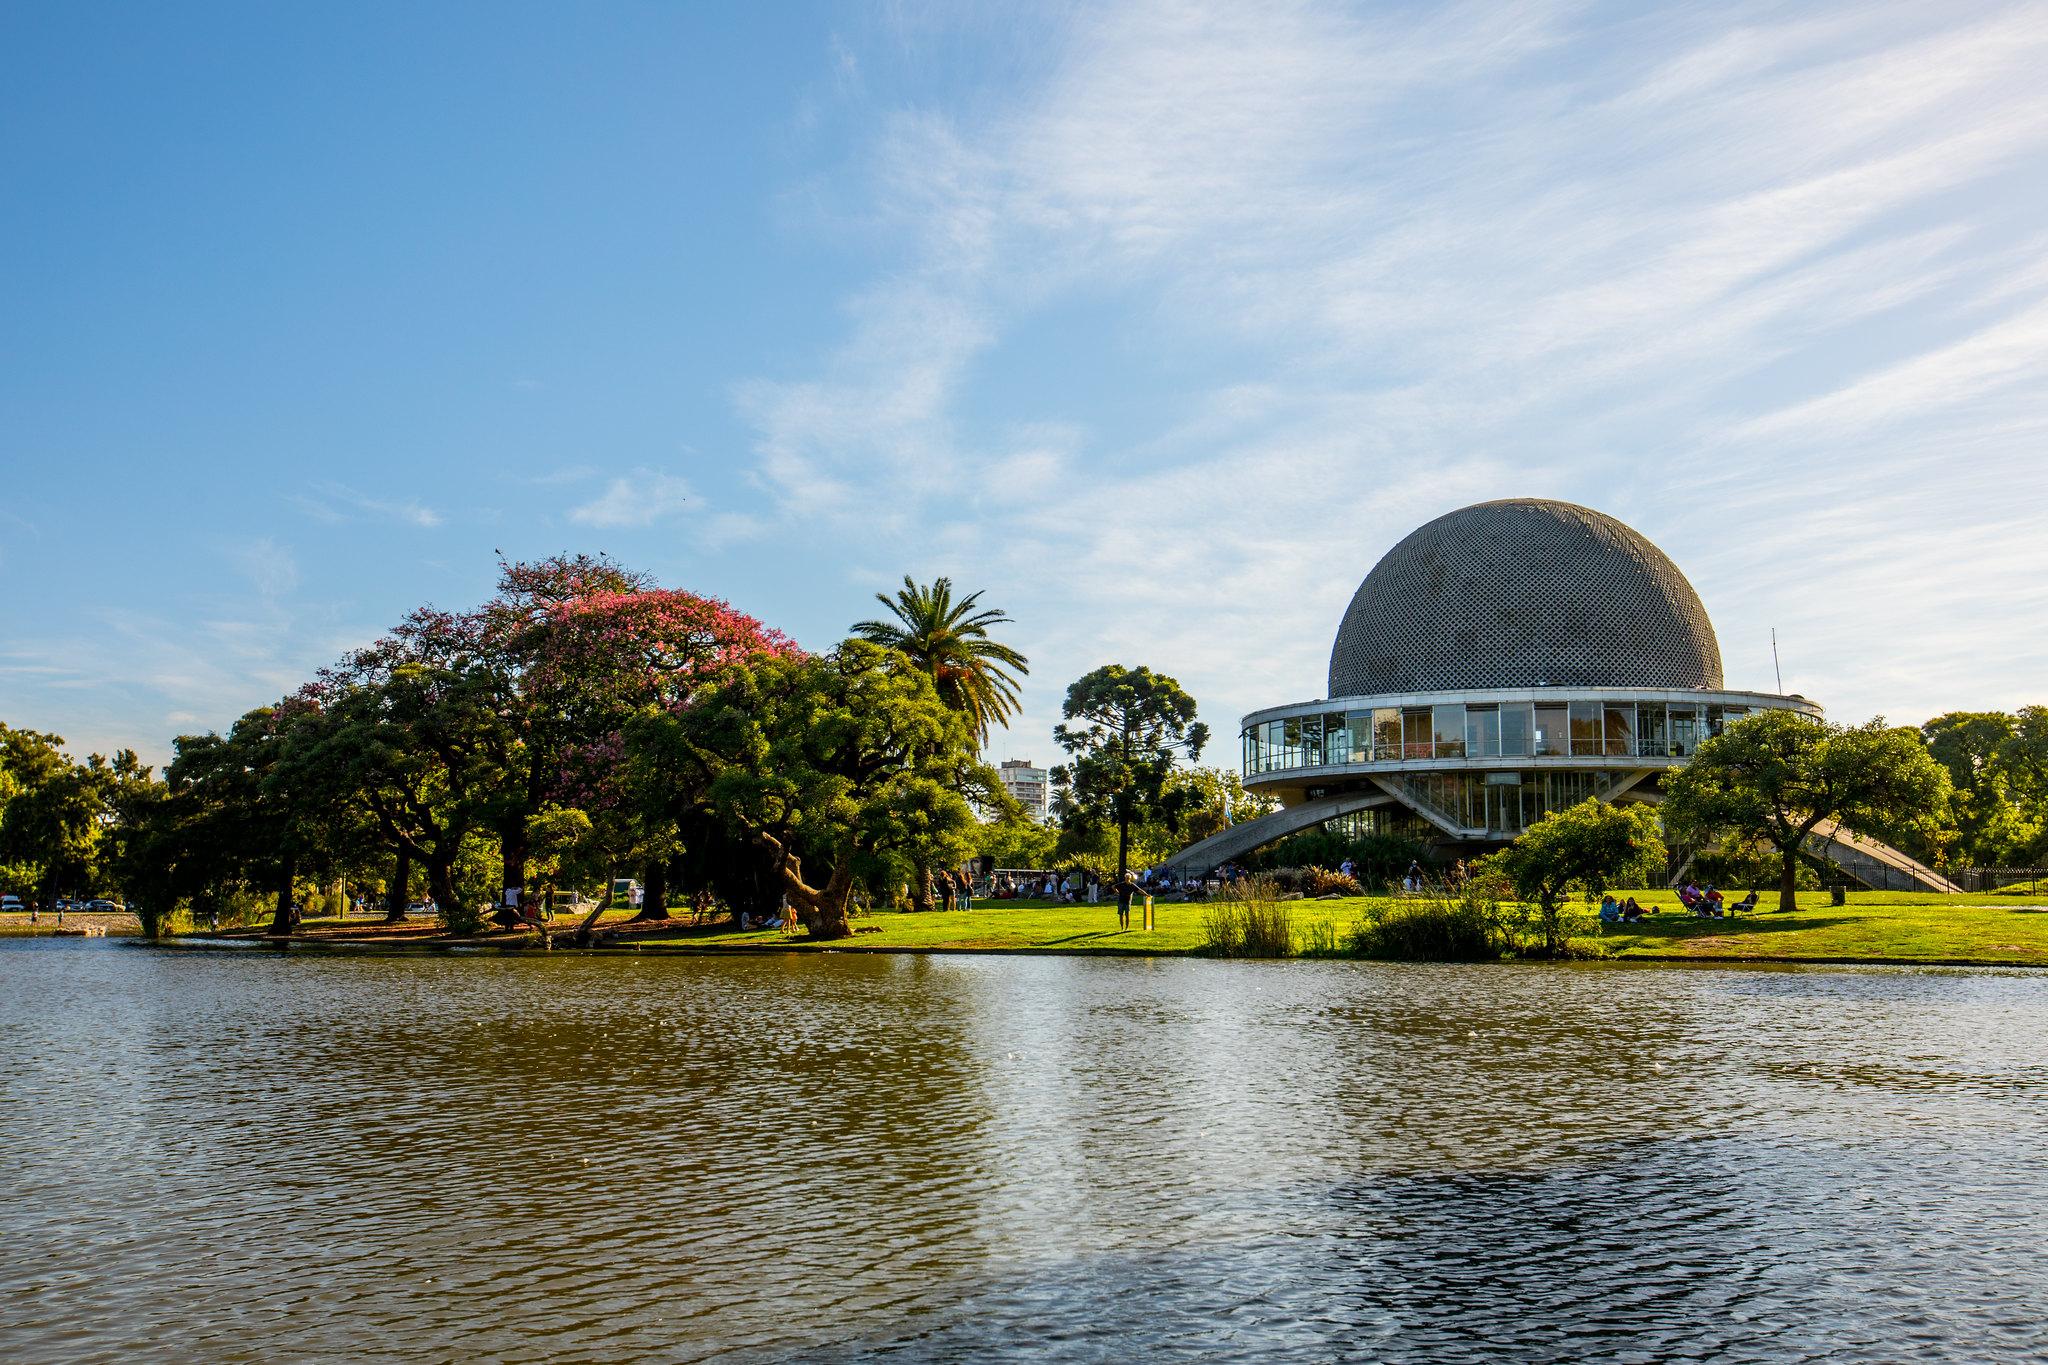 Planetario Galileo Galilei | Galileo Galilei Planetarium